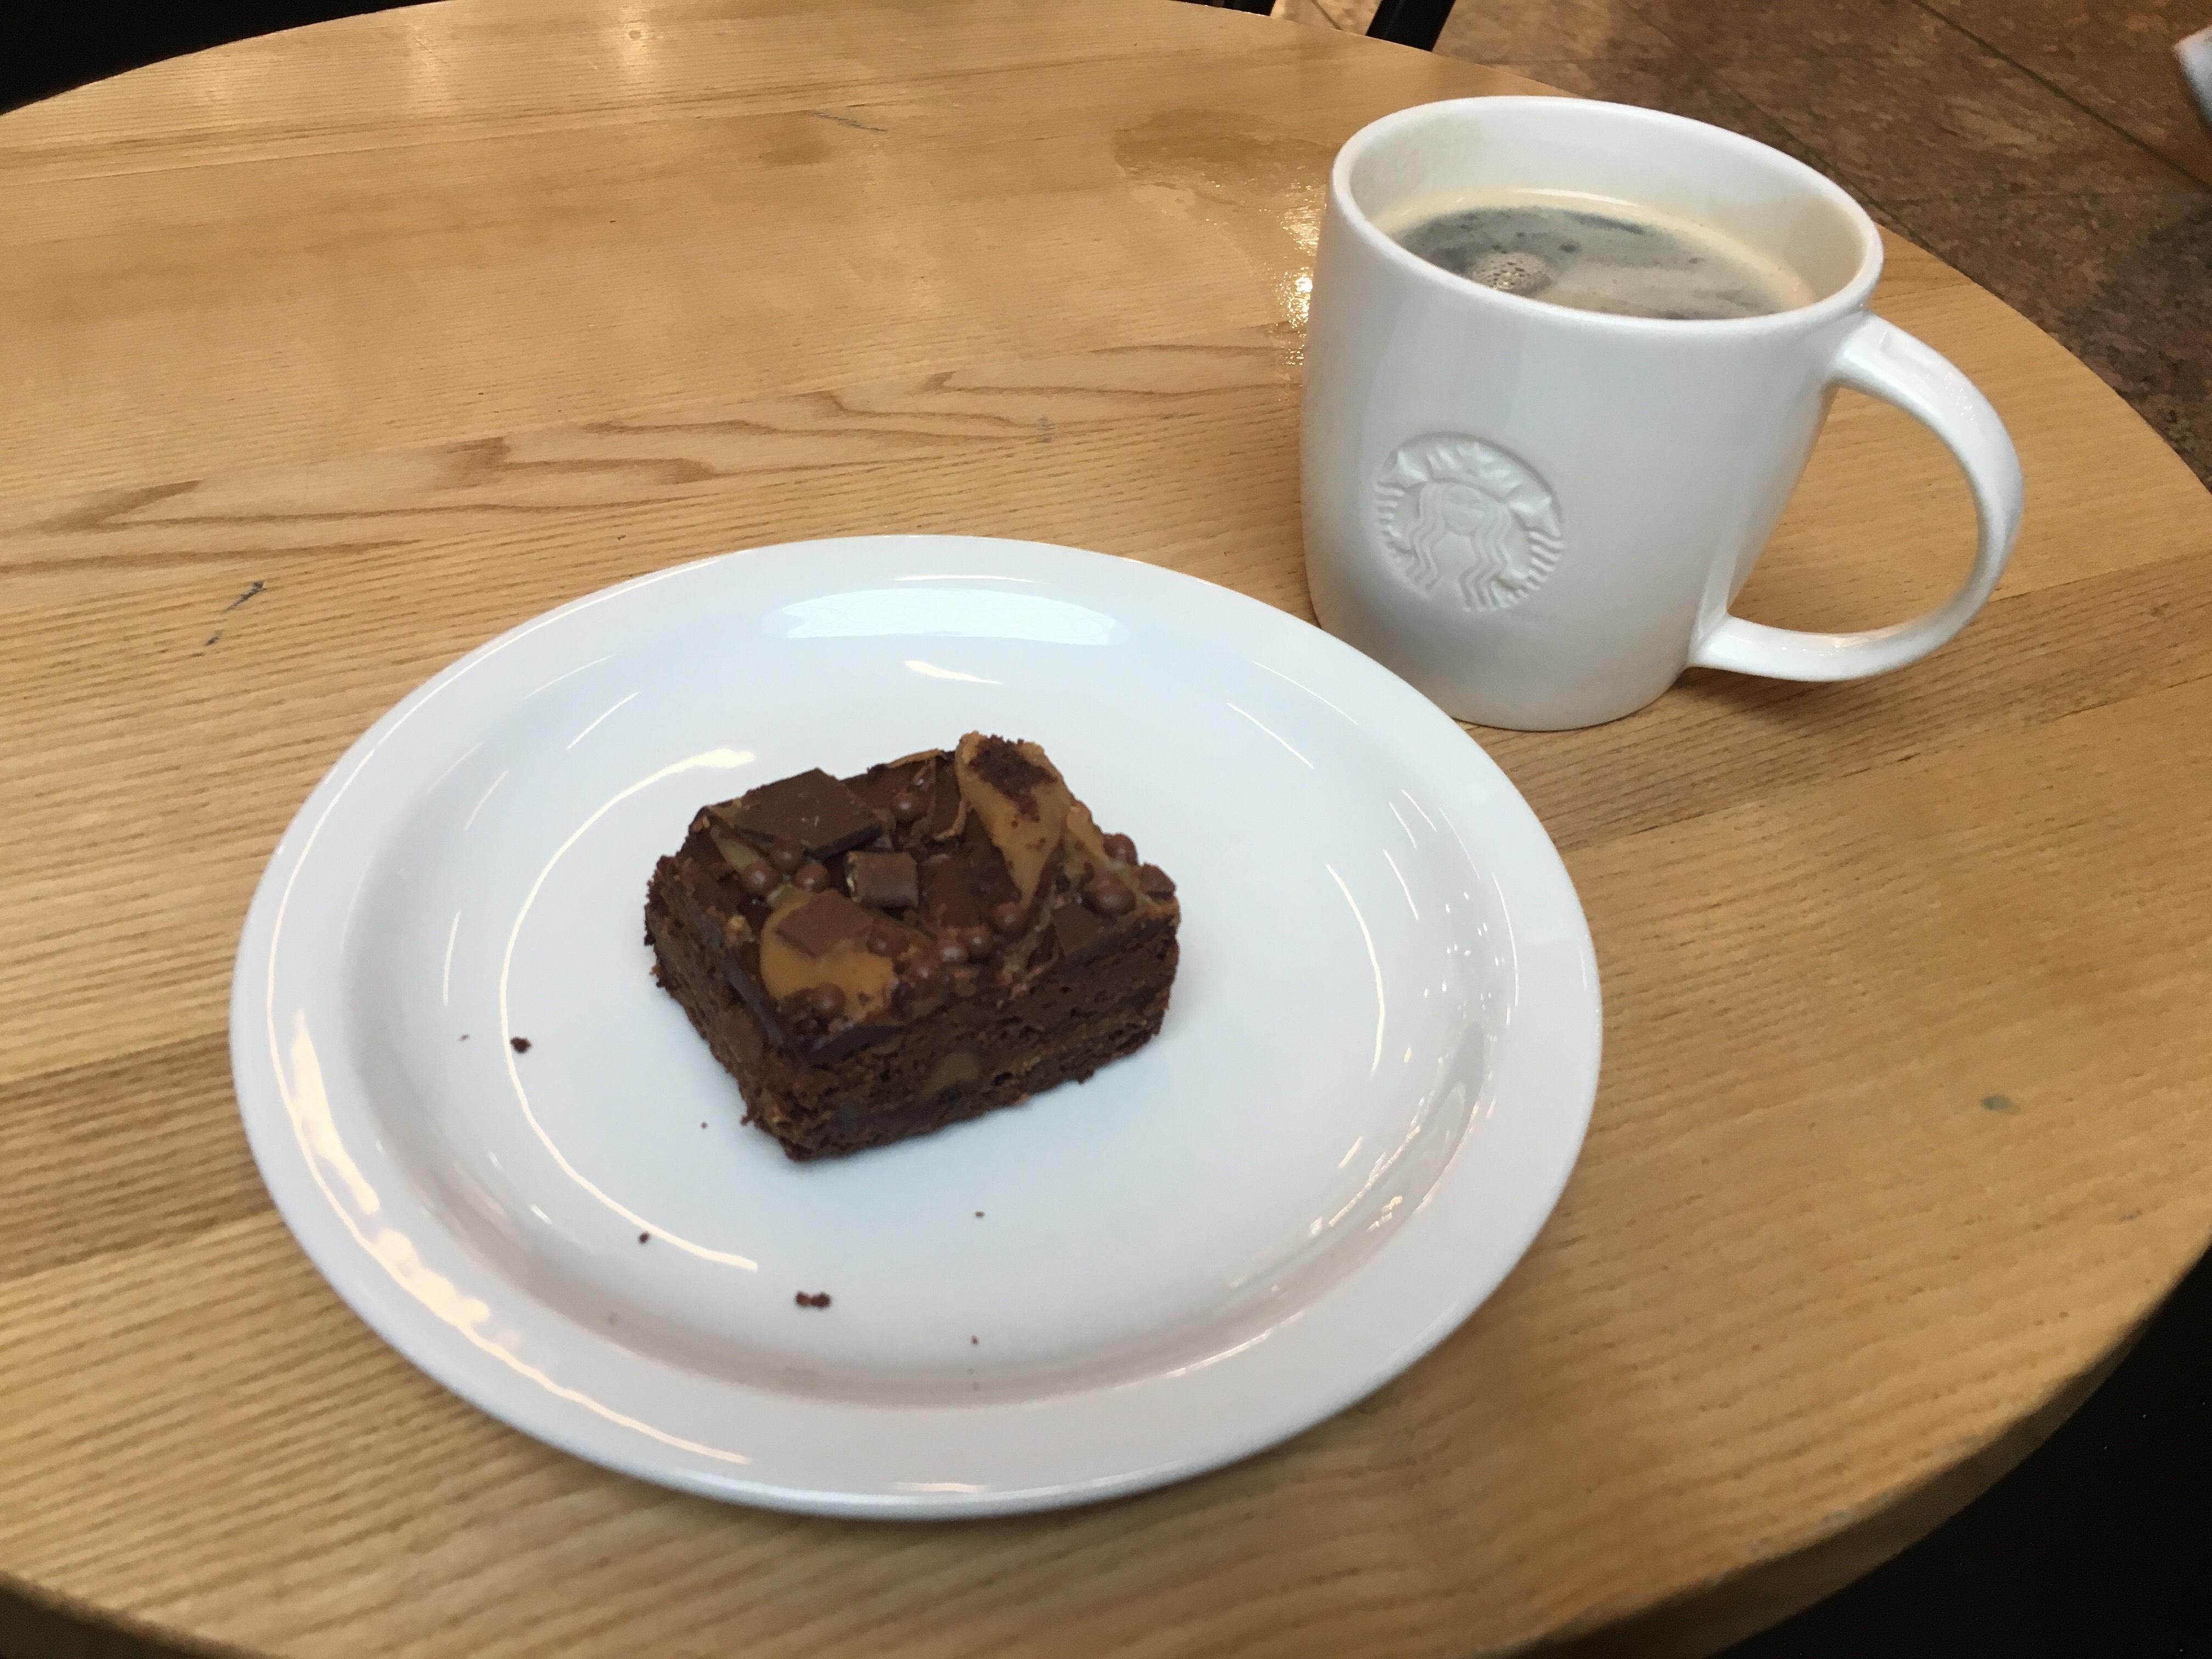 Starbucks £1 treats @ Meadowhall Branch